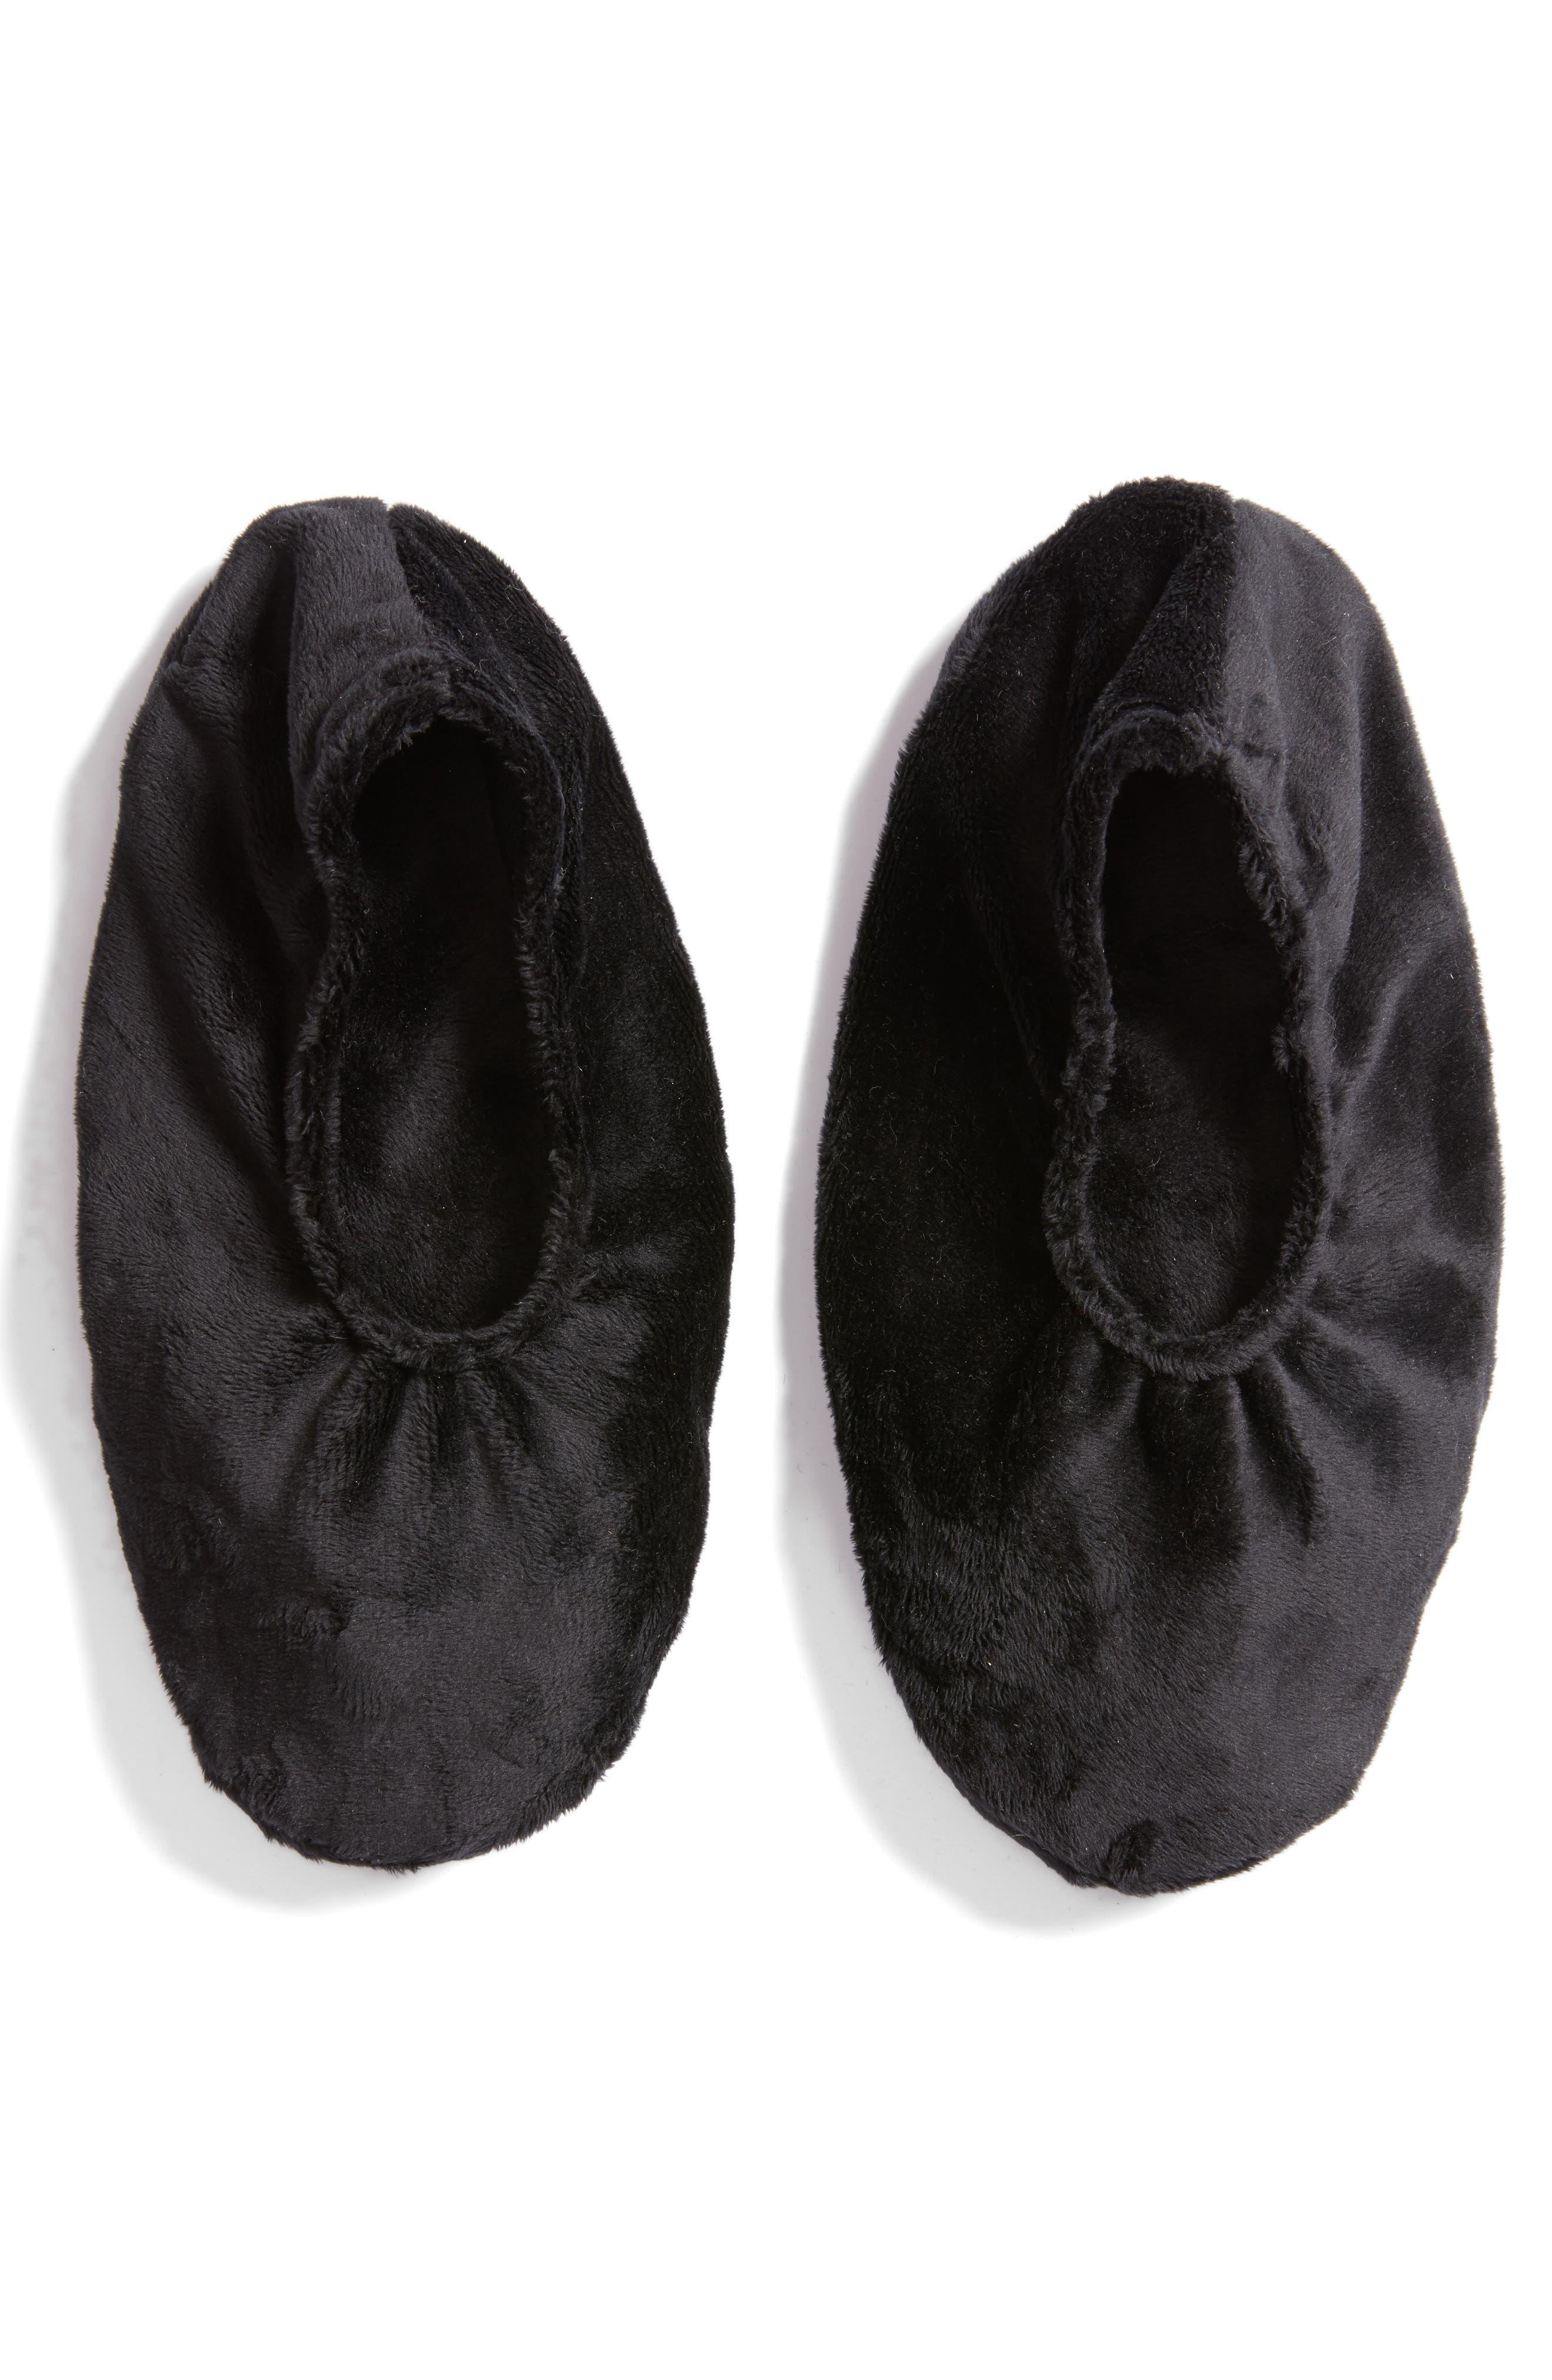 Solid Black Footies,                             Main thumbnail 1, color,                             000